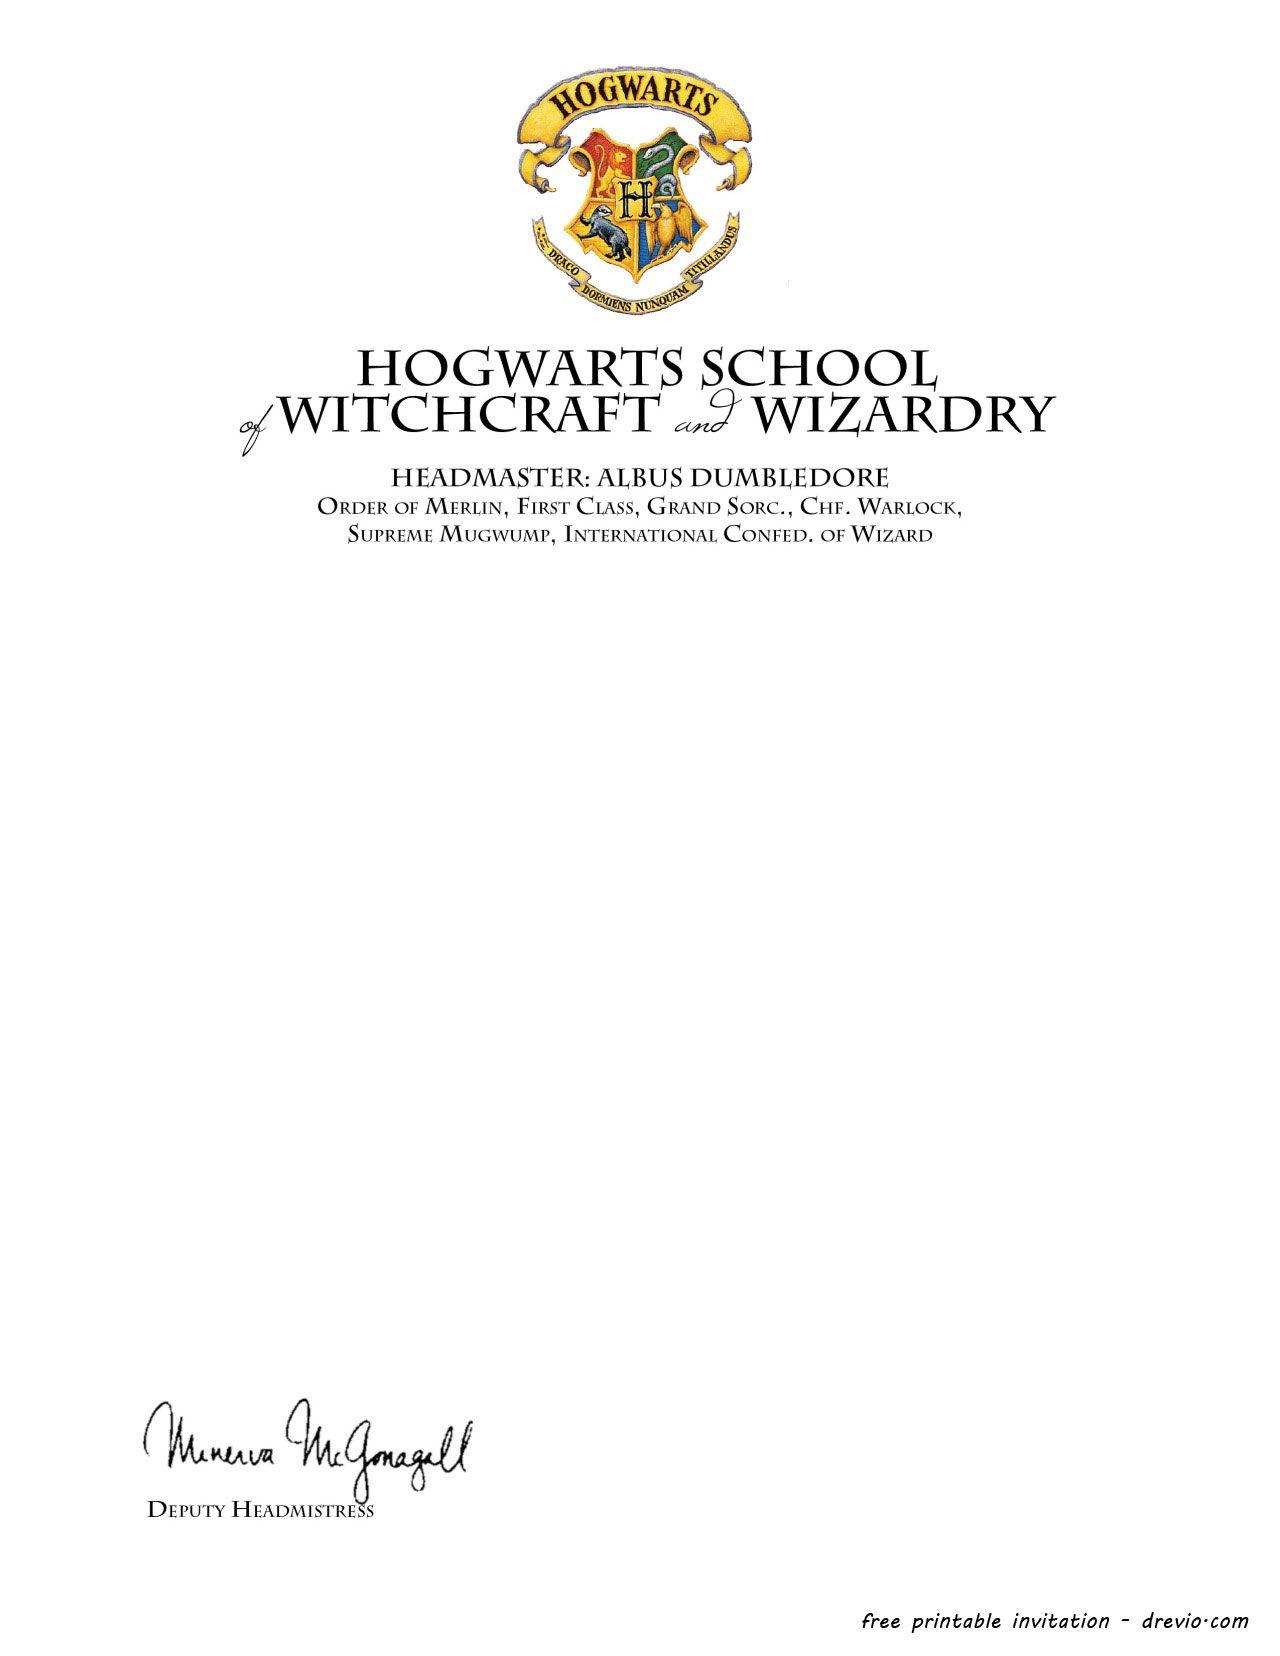 Harry Potter Birthday Invitations Printable - | Hosting A Harry - Harry Potter Birthday Invitations Free Printable